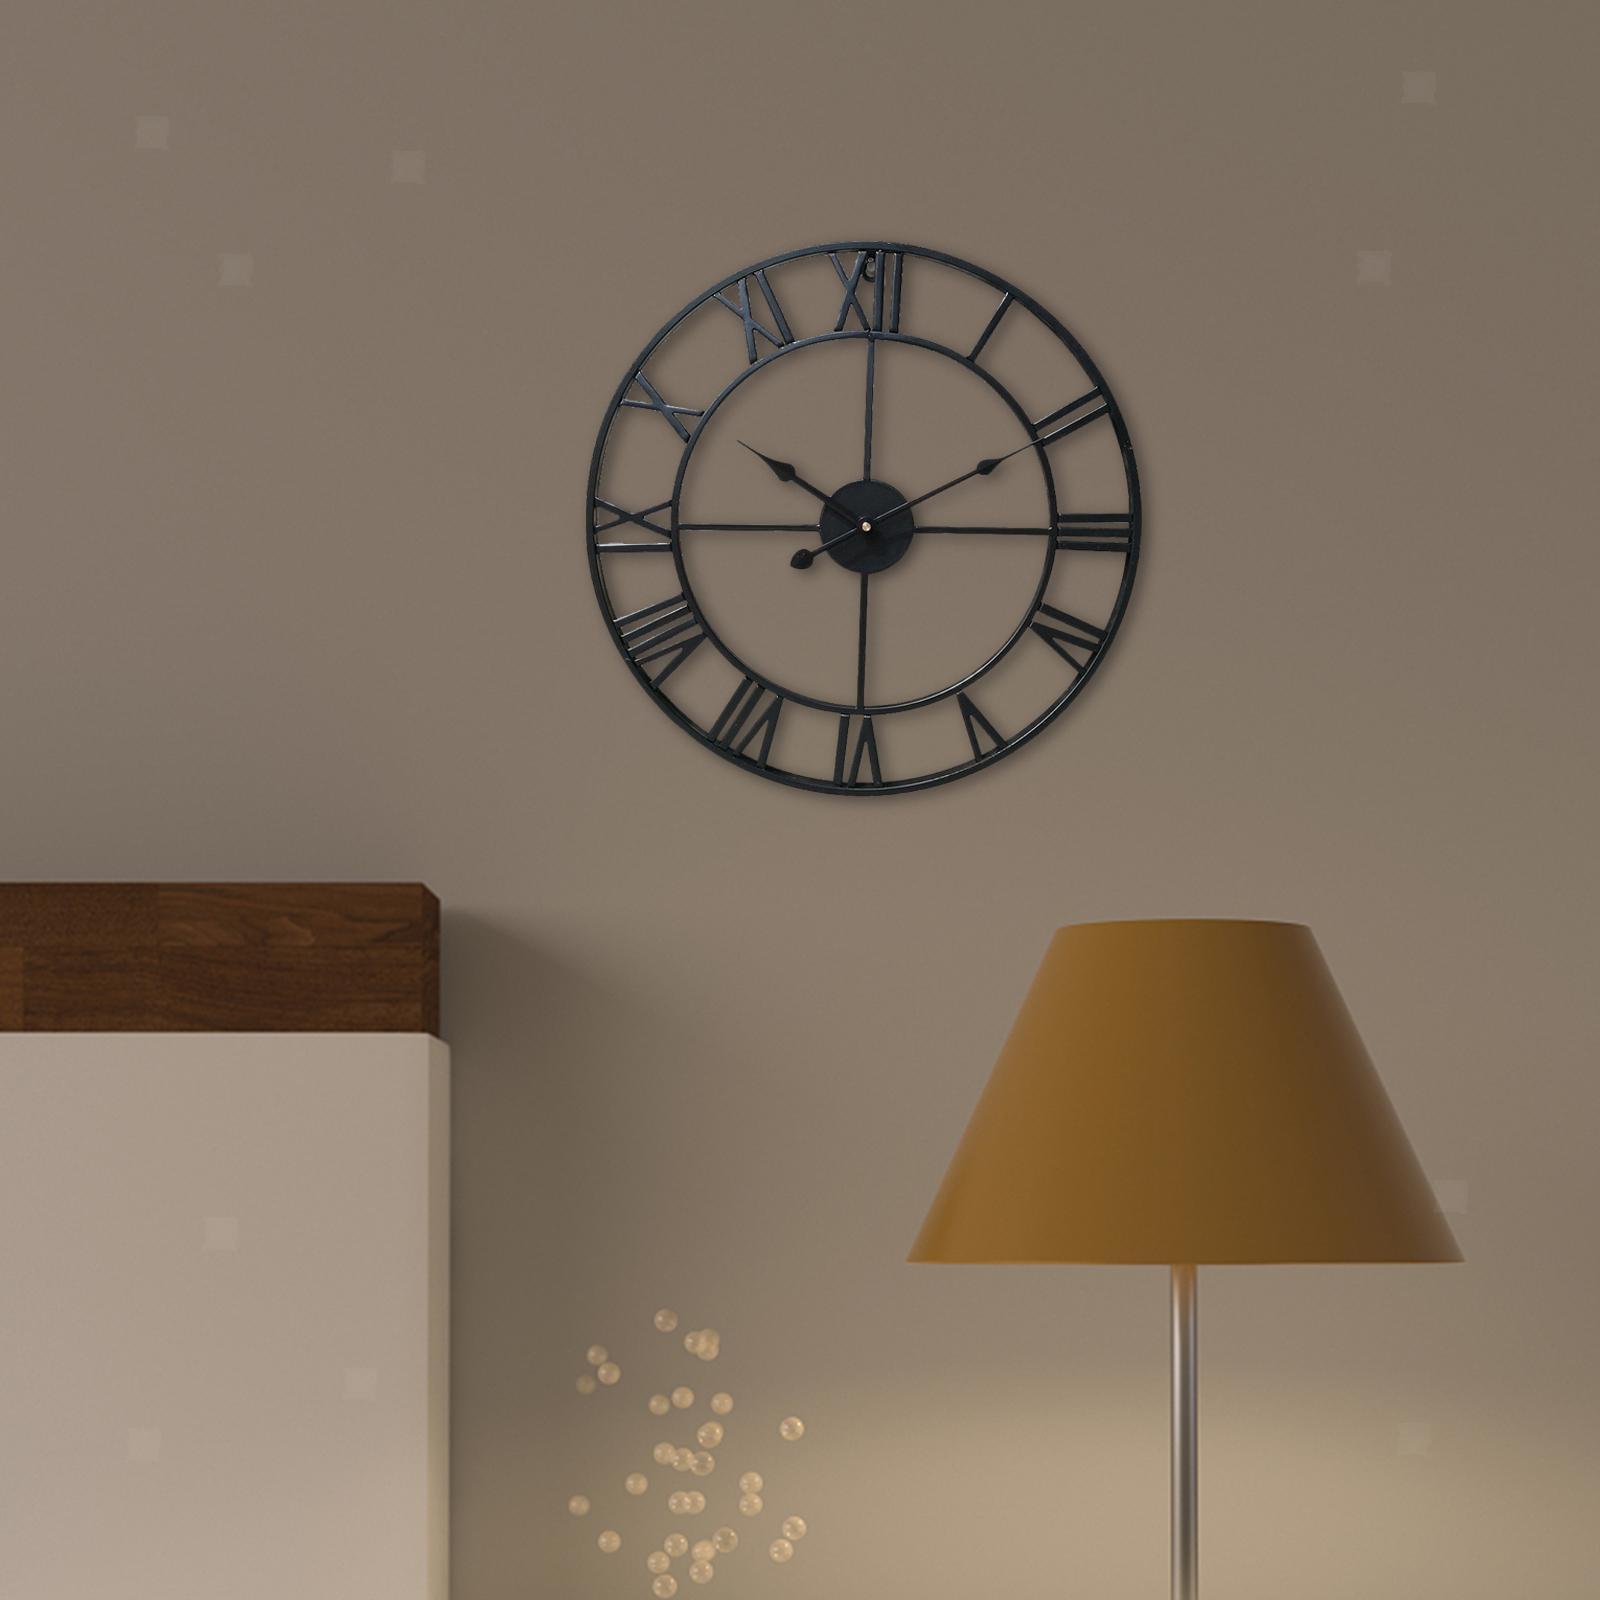 Vintage Round Retro Time Big Display Clock Mechanism Wall